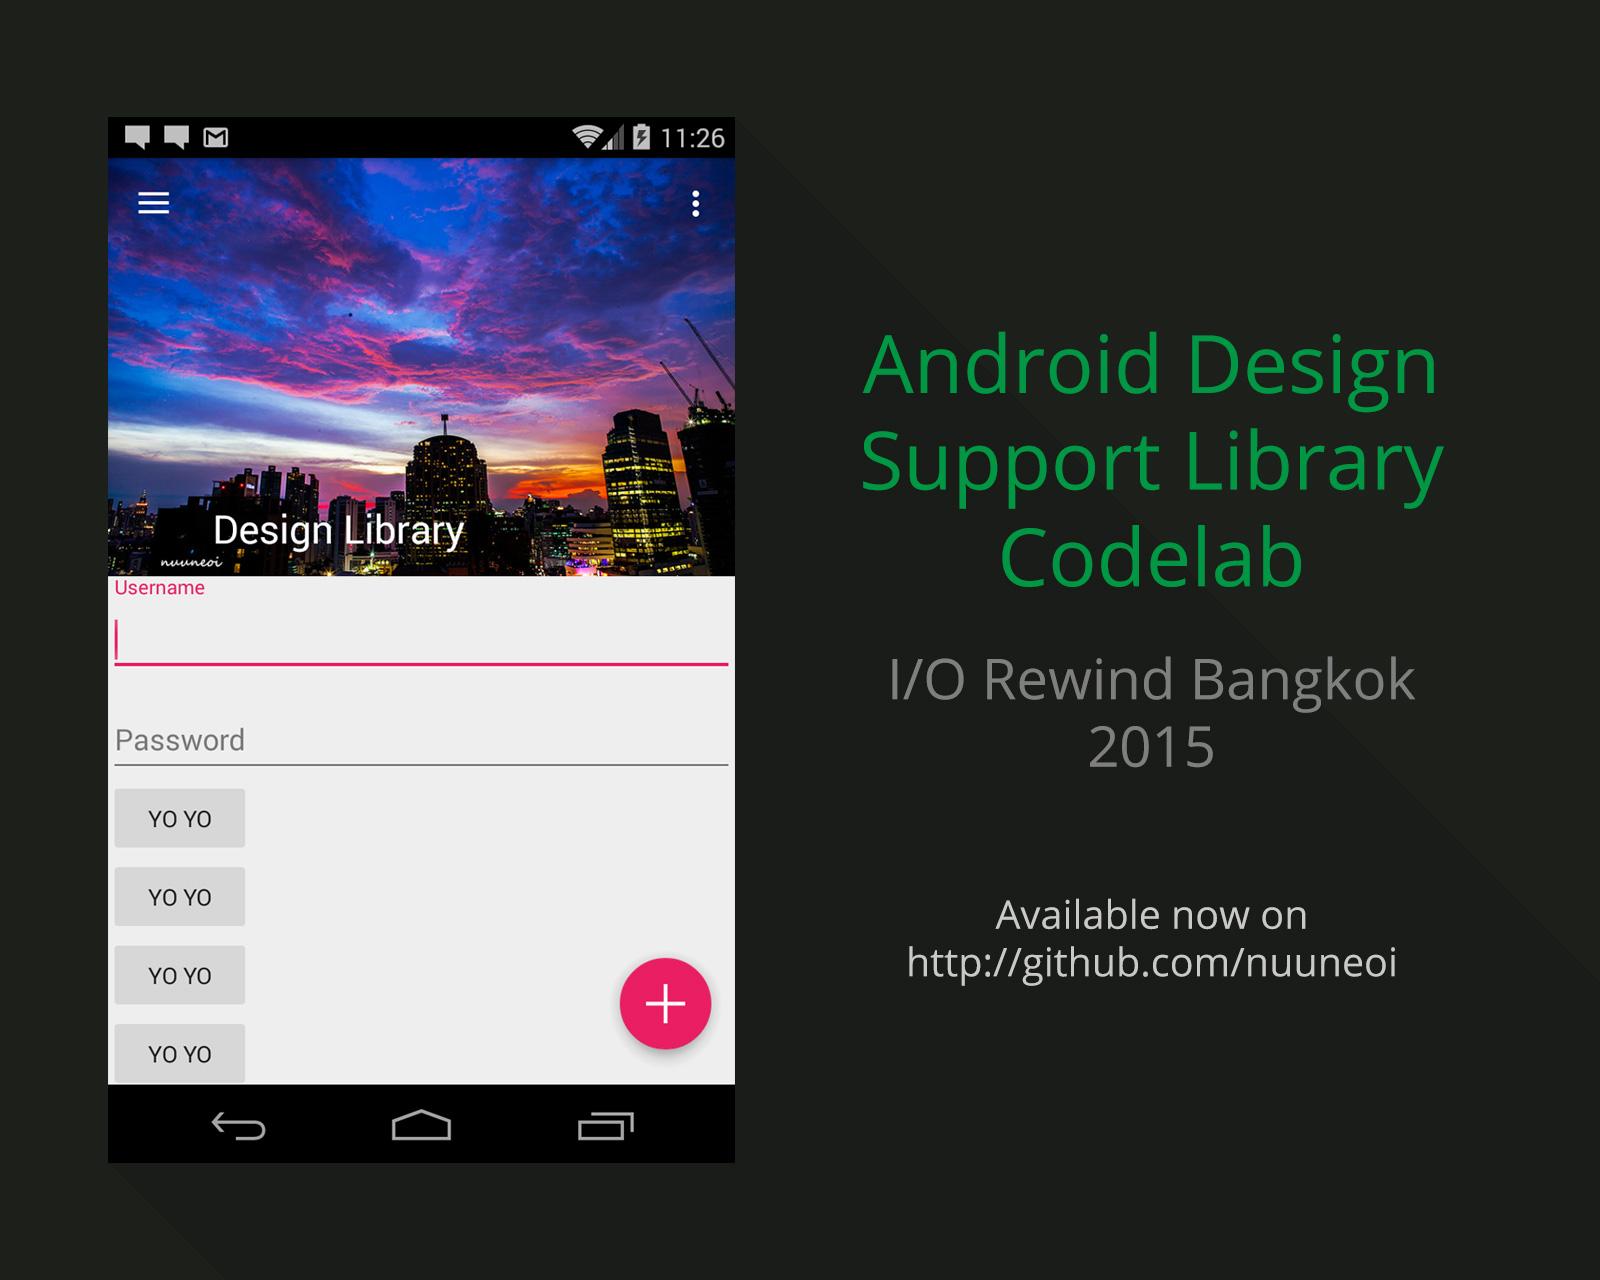 GitHub - nuuneoi/Lab-Android-DesignLibrary